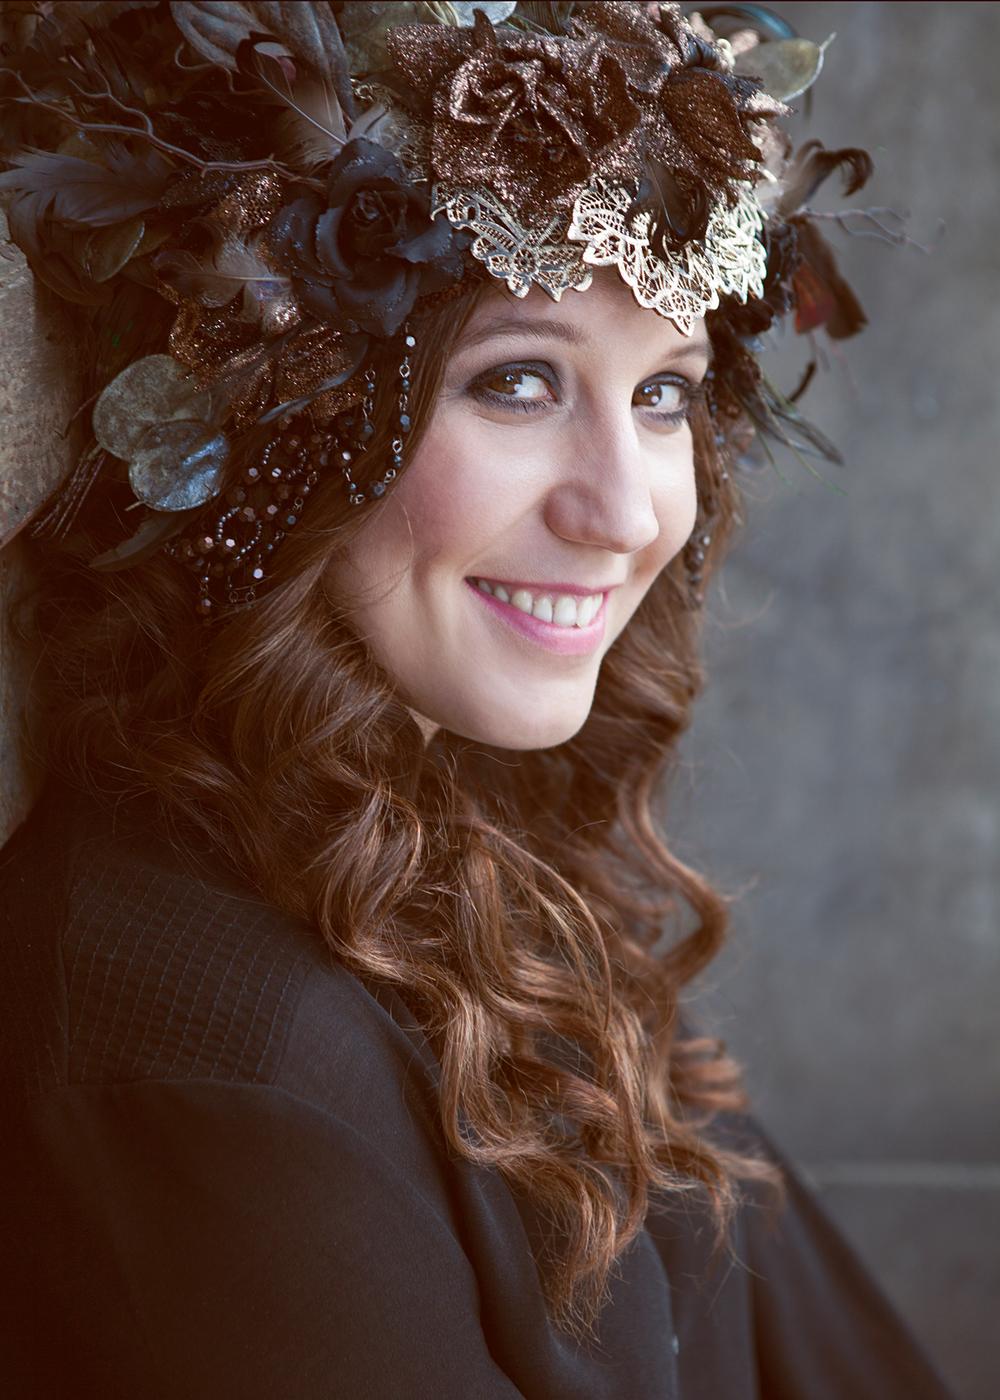 Katja Moslehner